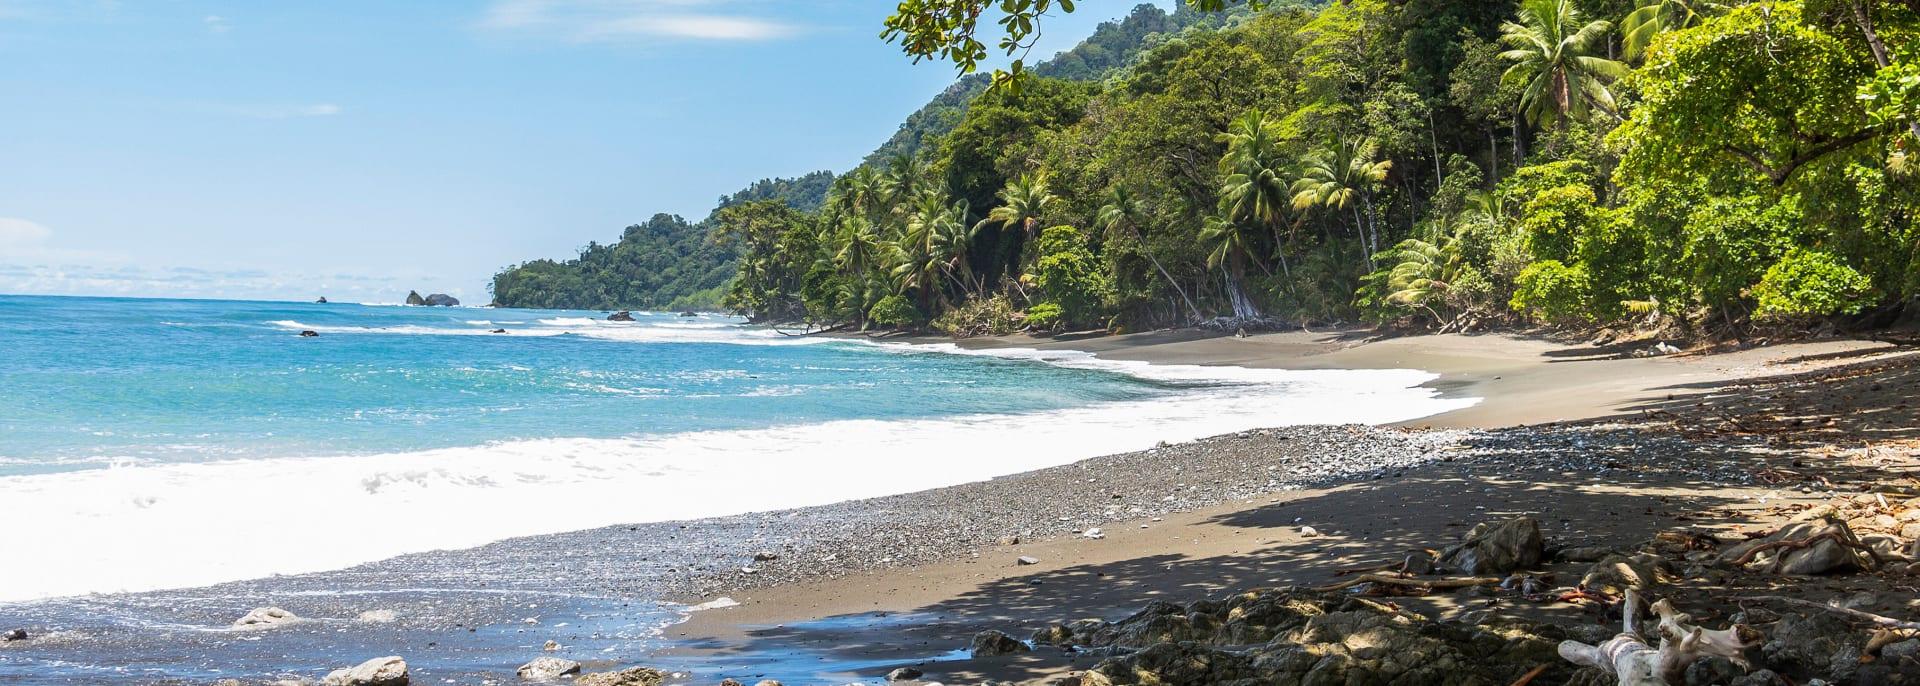 Corcovado & Halbinsel Osa, Costa Rica